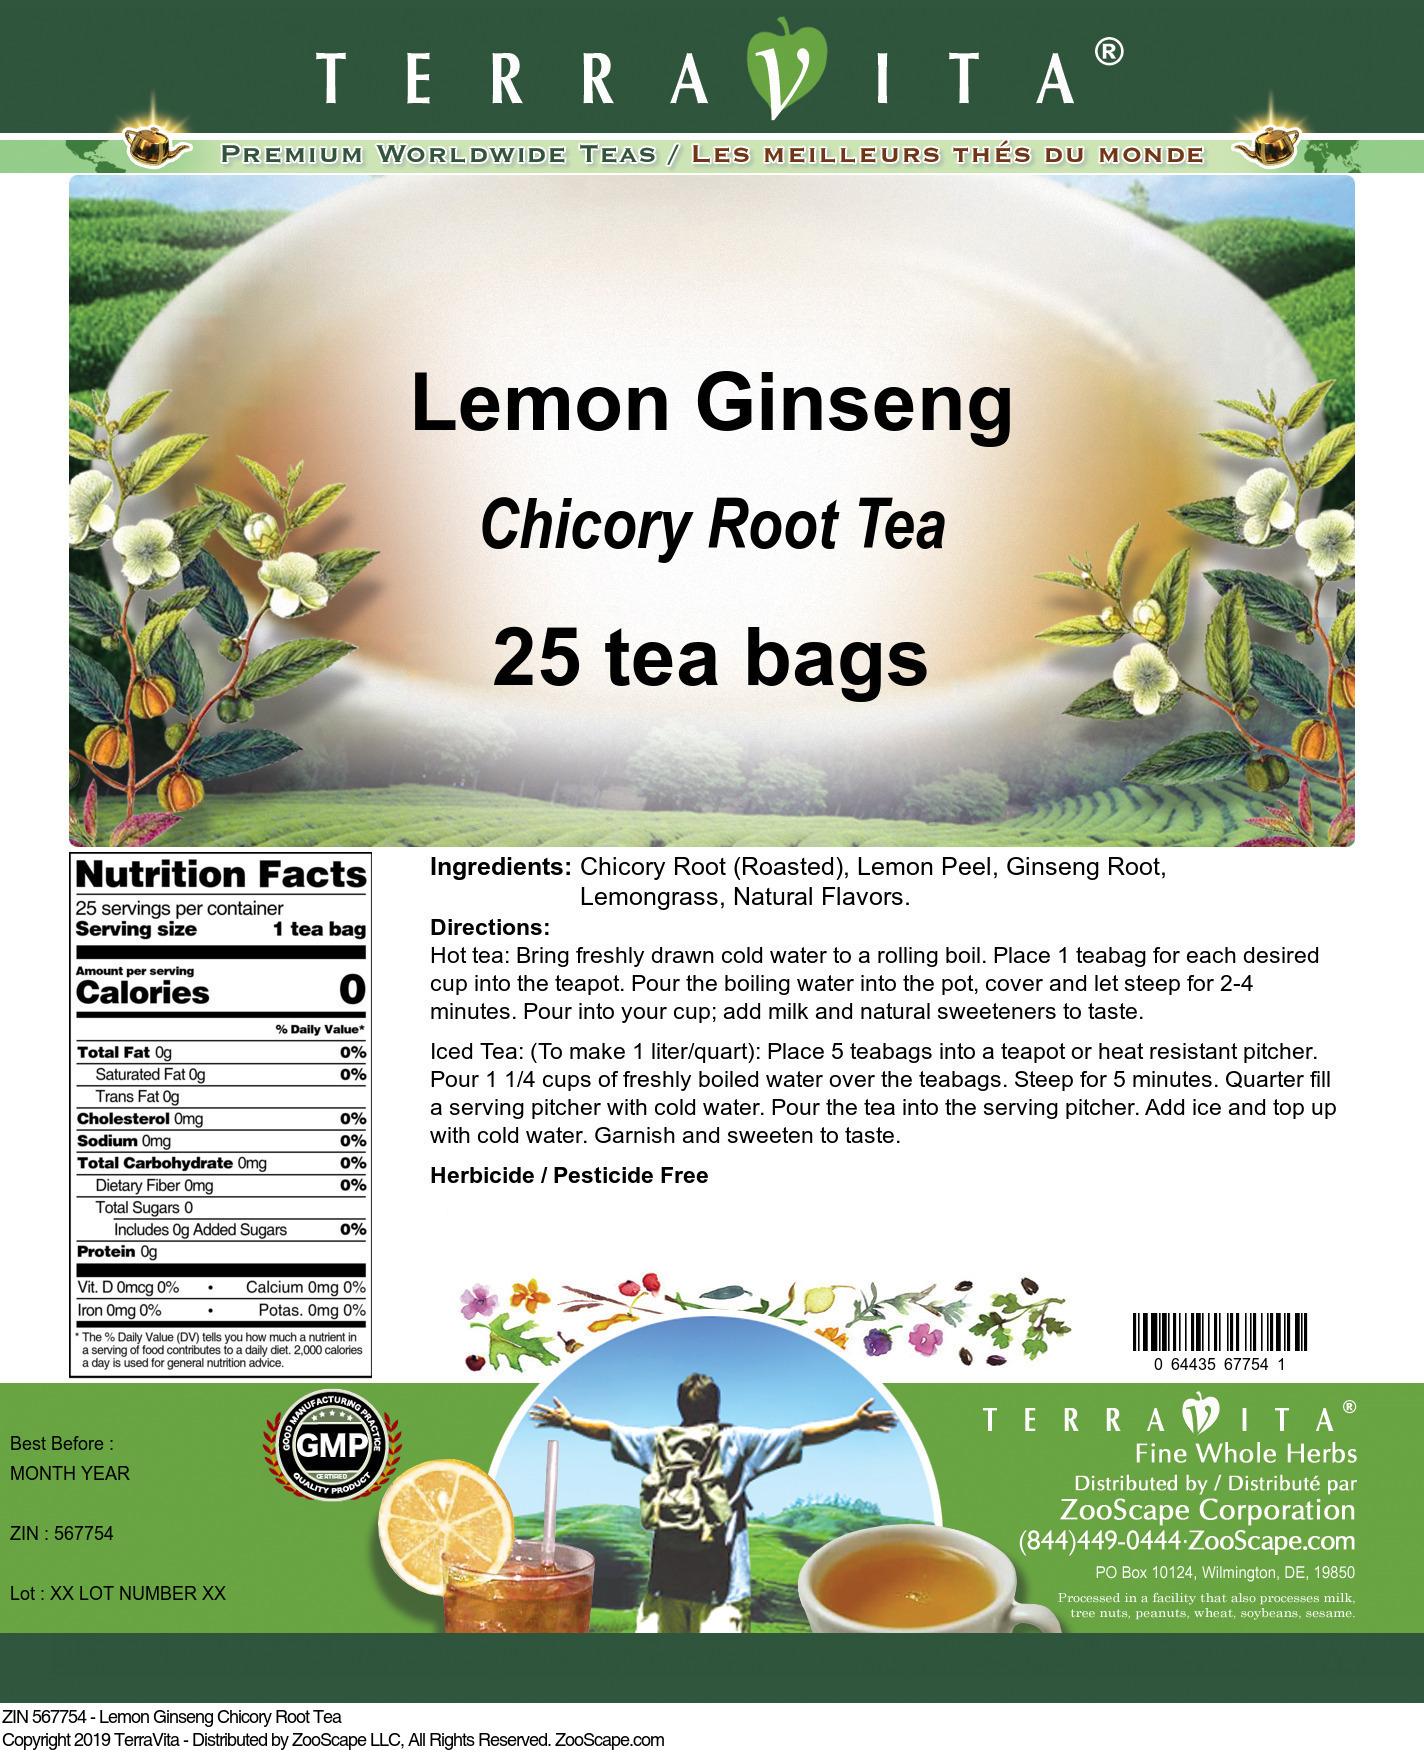 Lemon Ginseng Chicory Root Tea